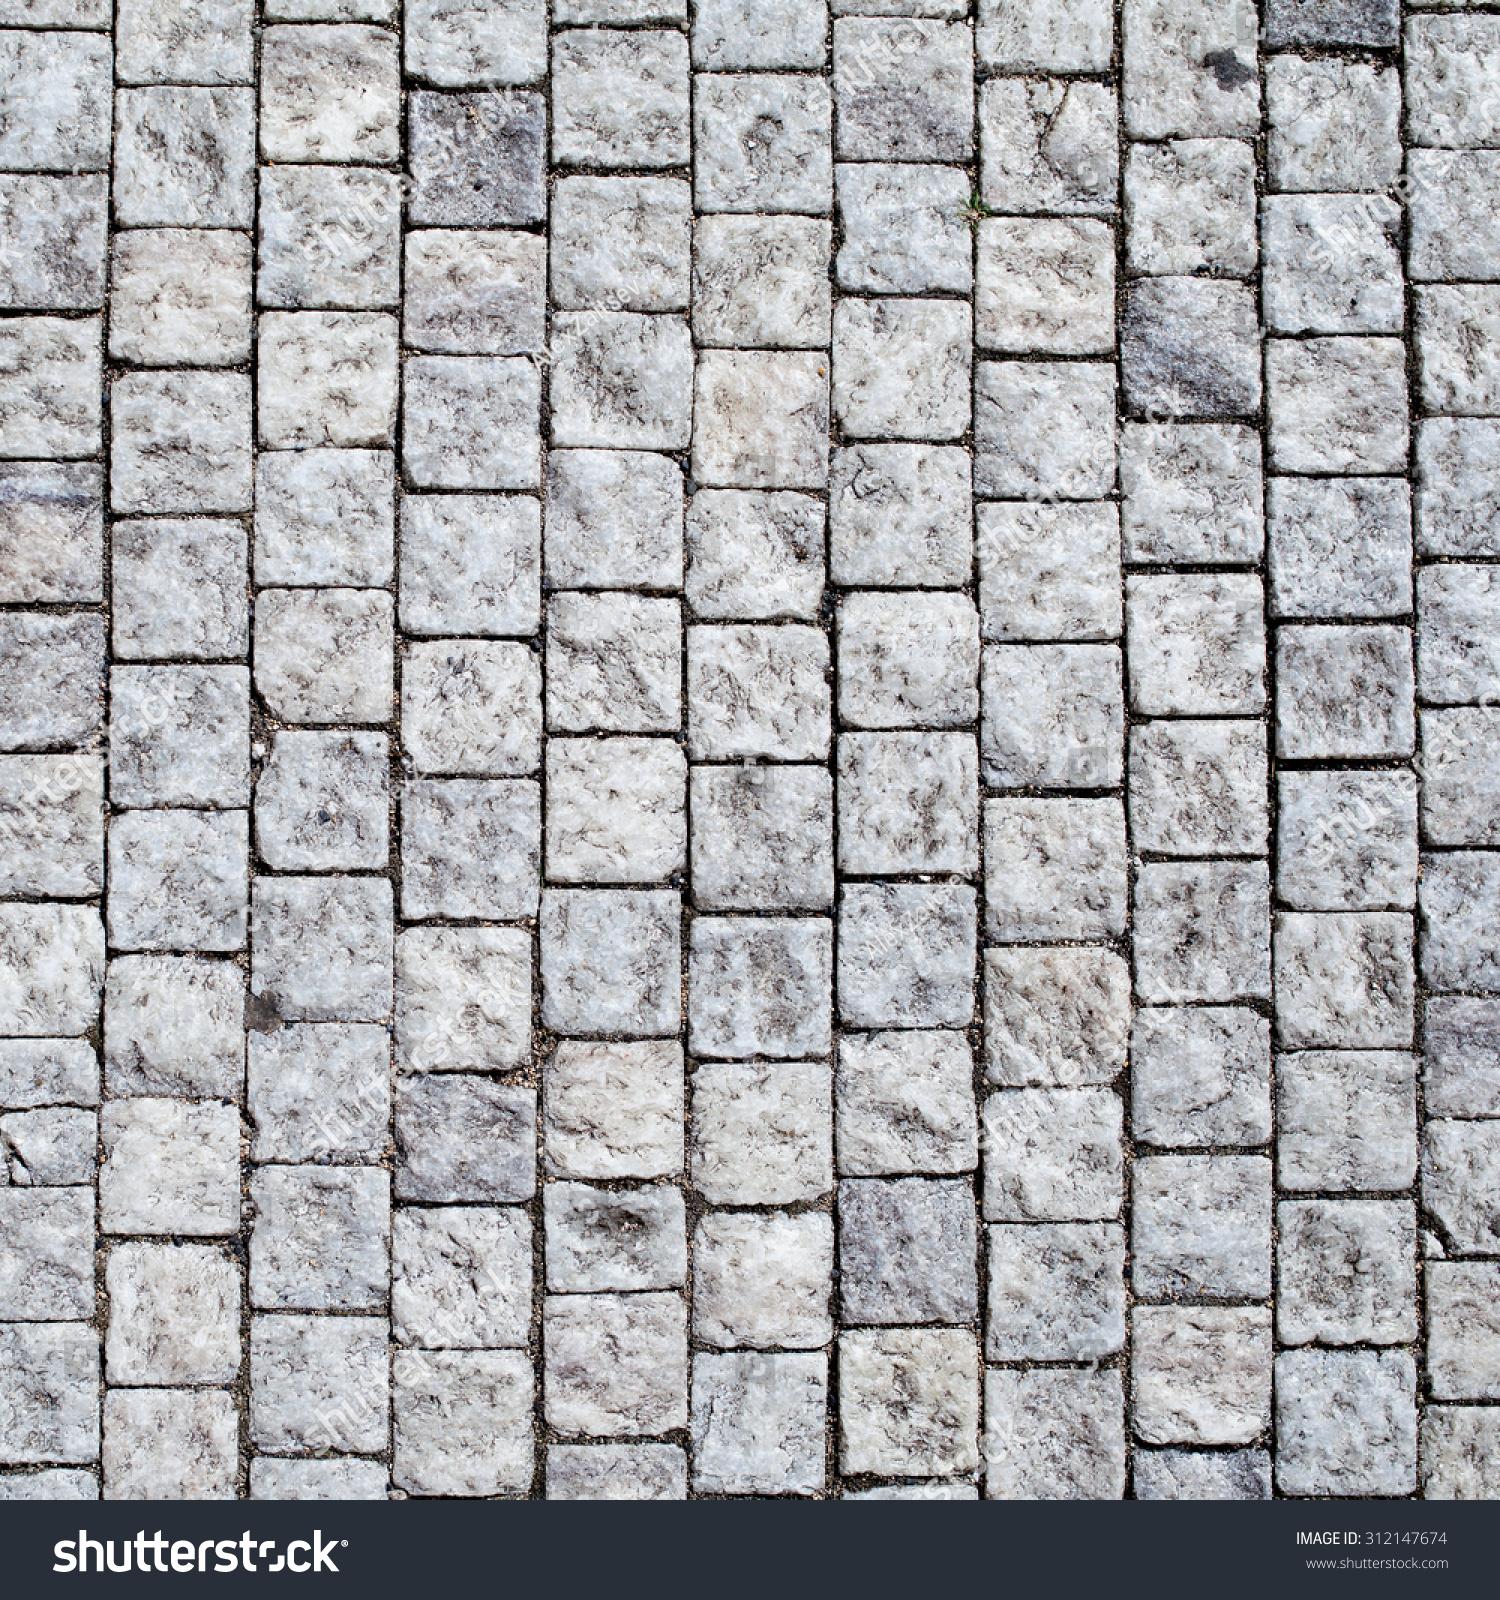 Granite Background Texture : Stone pavement texture granite cobble stoned stock photo